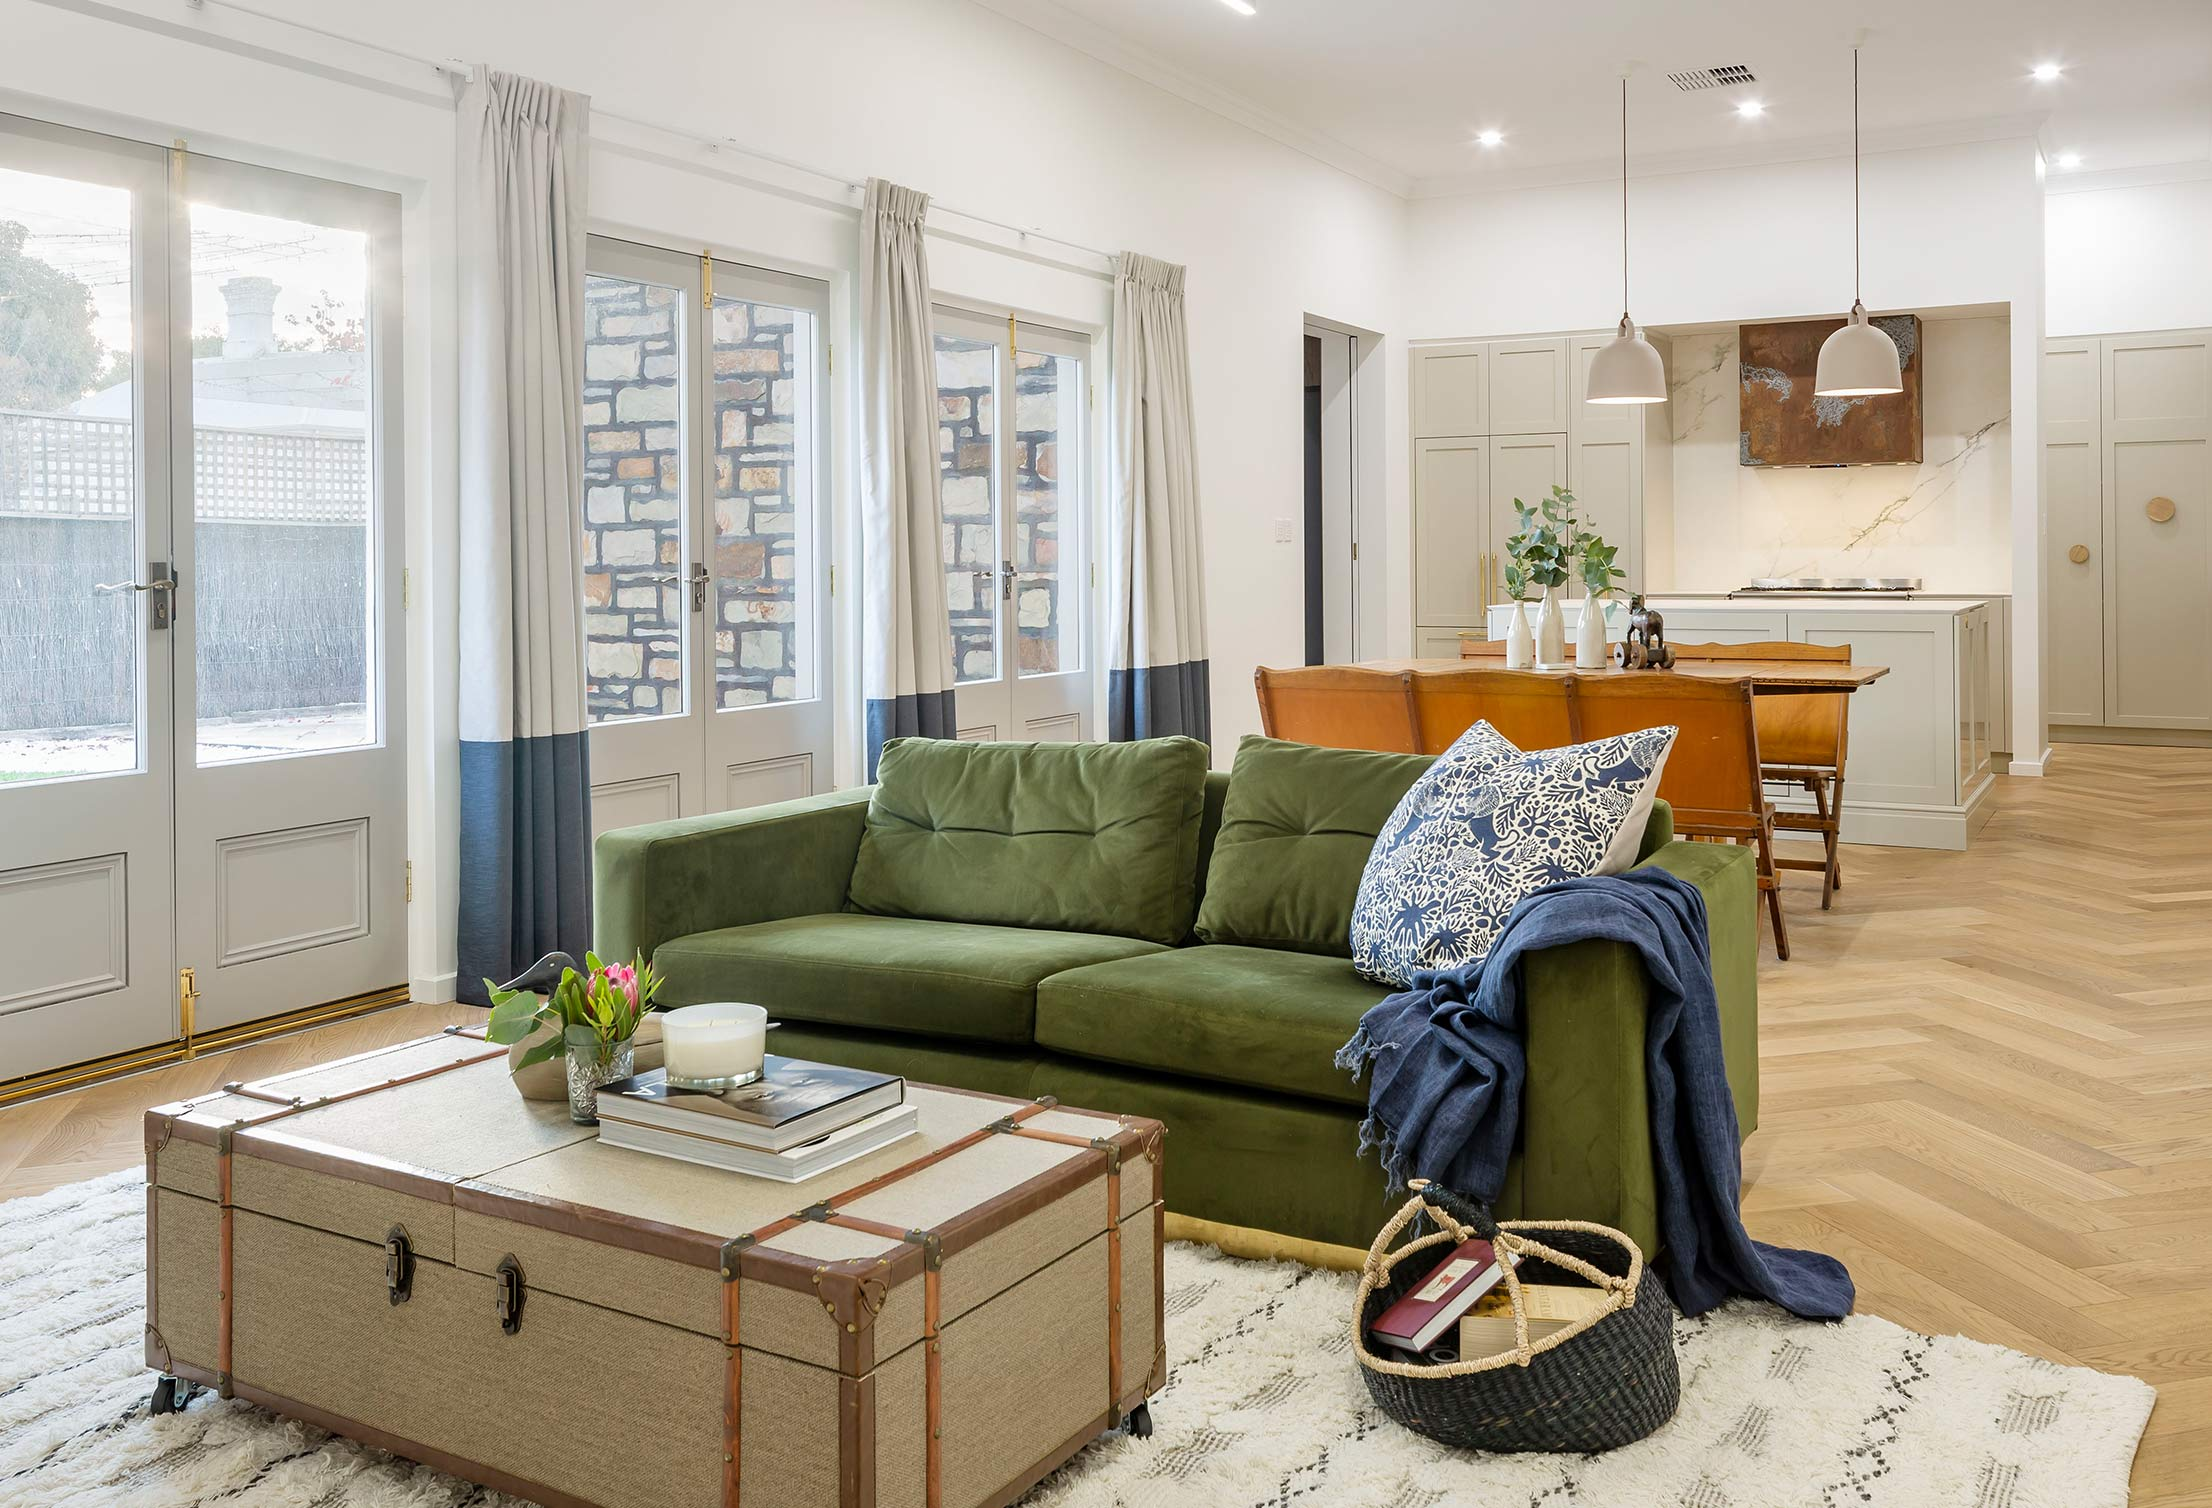 turnbull-built-renovation-family-goodwood-sa.jpg